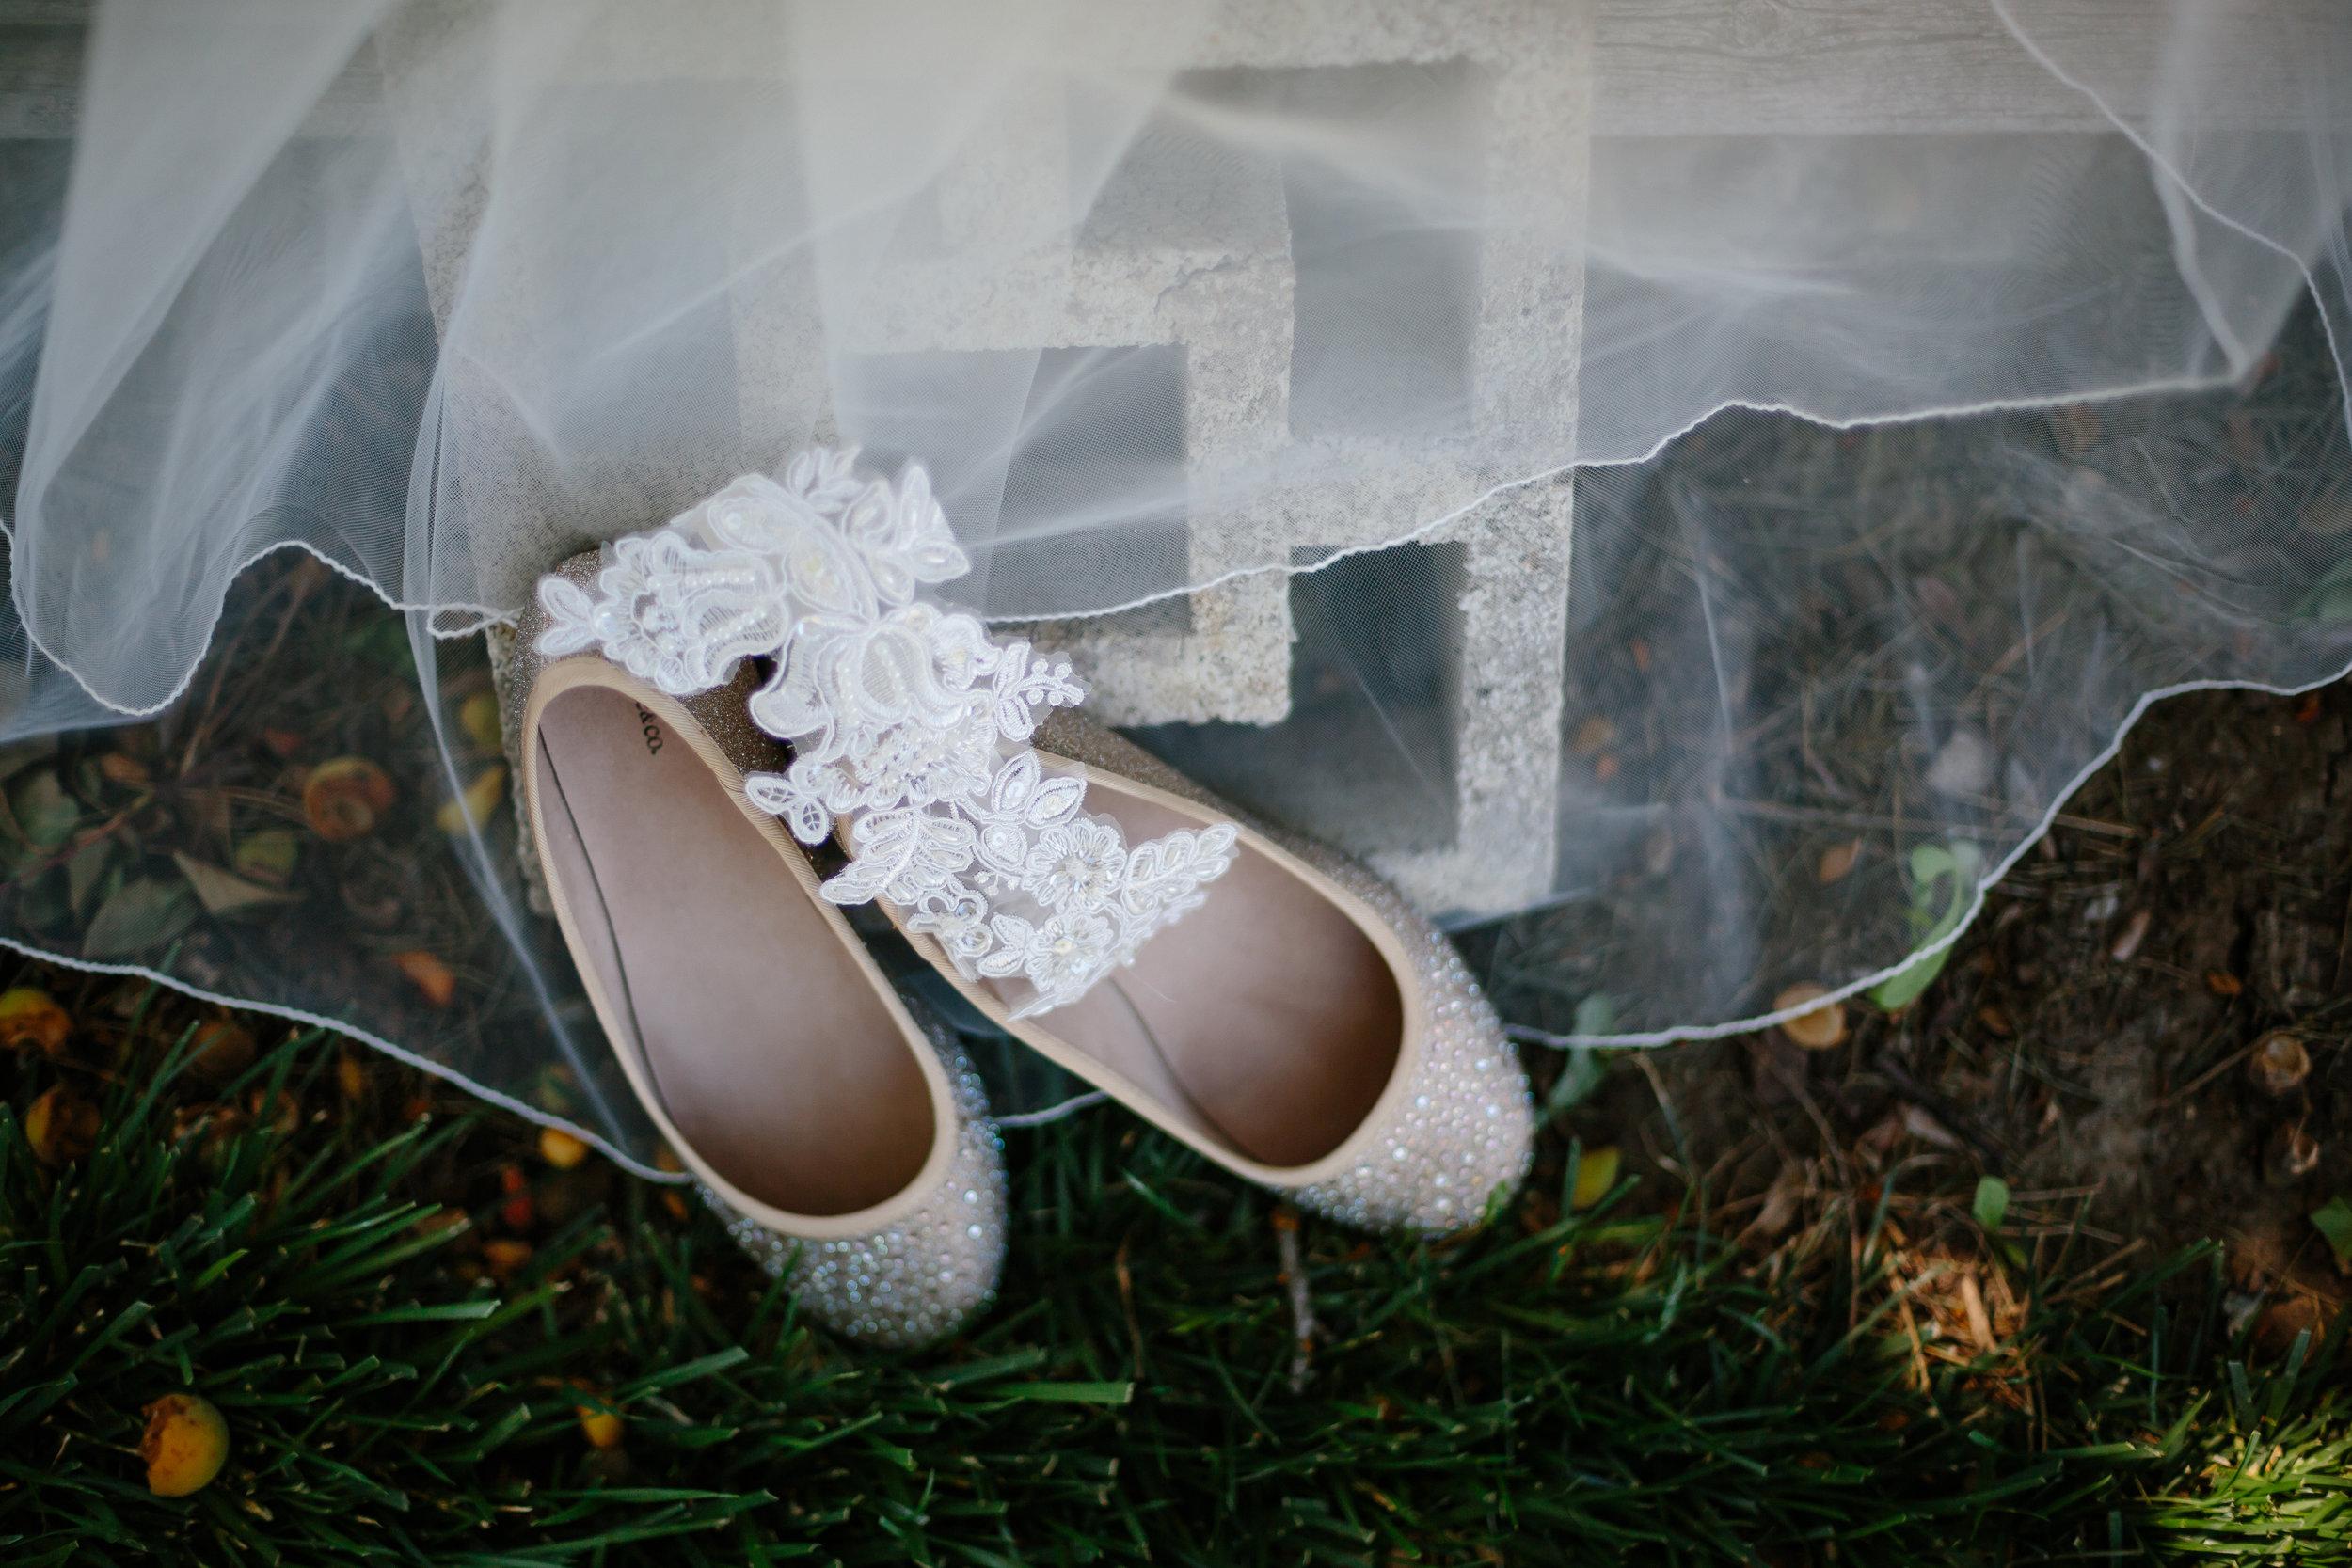 Jordan & Shantel Married - Idaho - Corrie Mick Photography-8.jpg